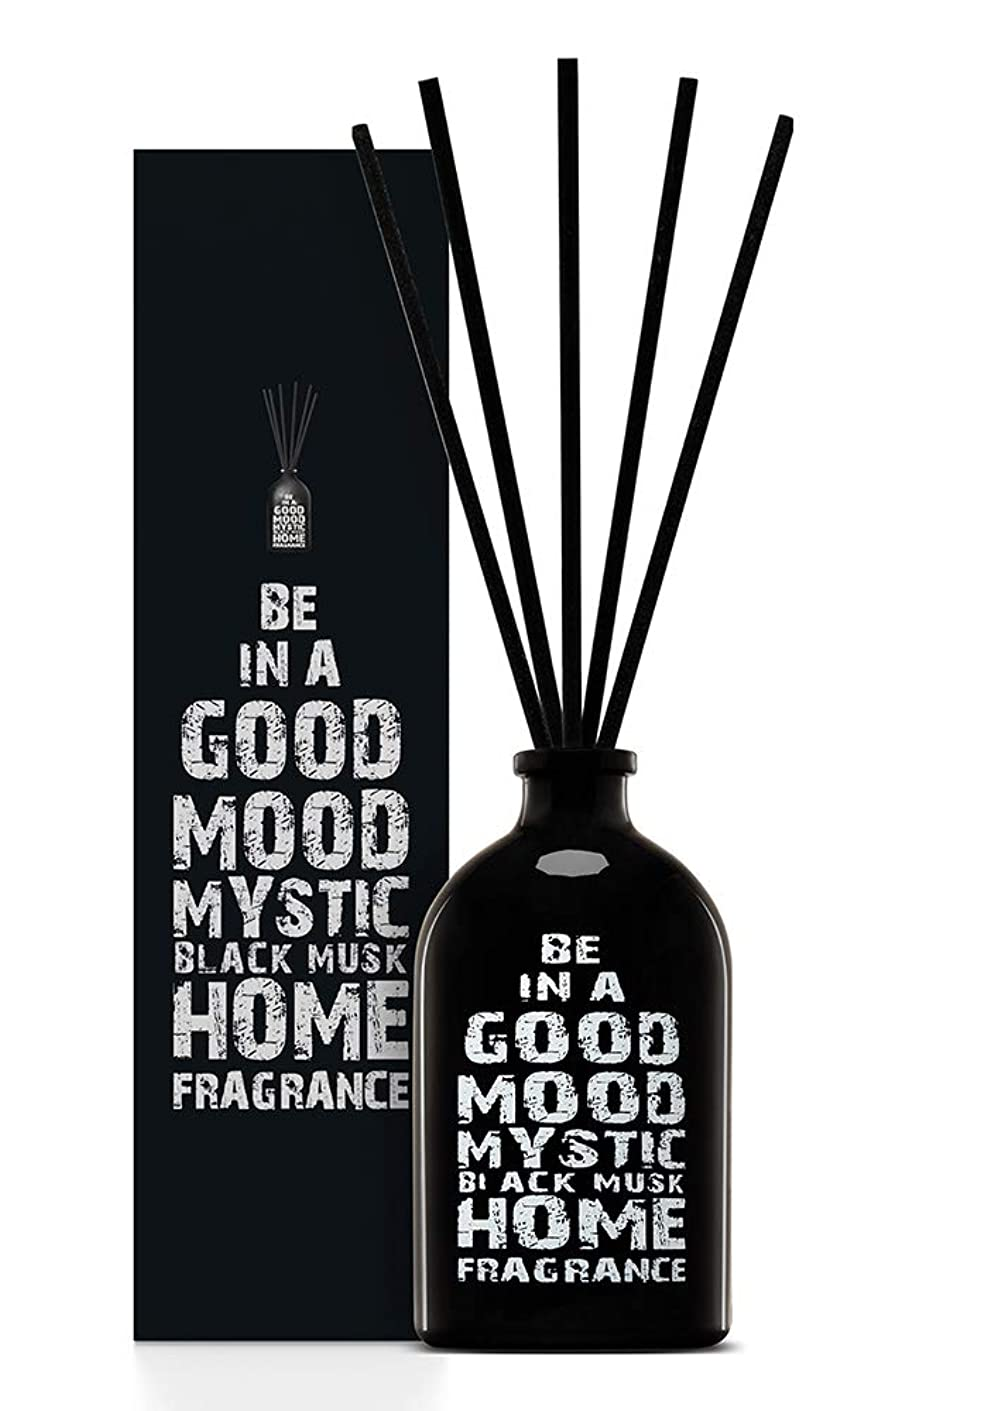 BE IN A GOOD MOOD ルームフレグランス スティック タイプ BLACK MUSKの香り (100ml)